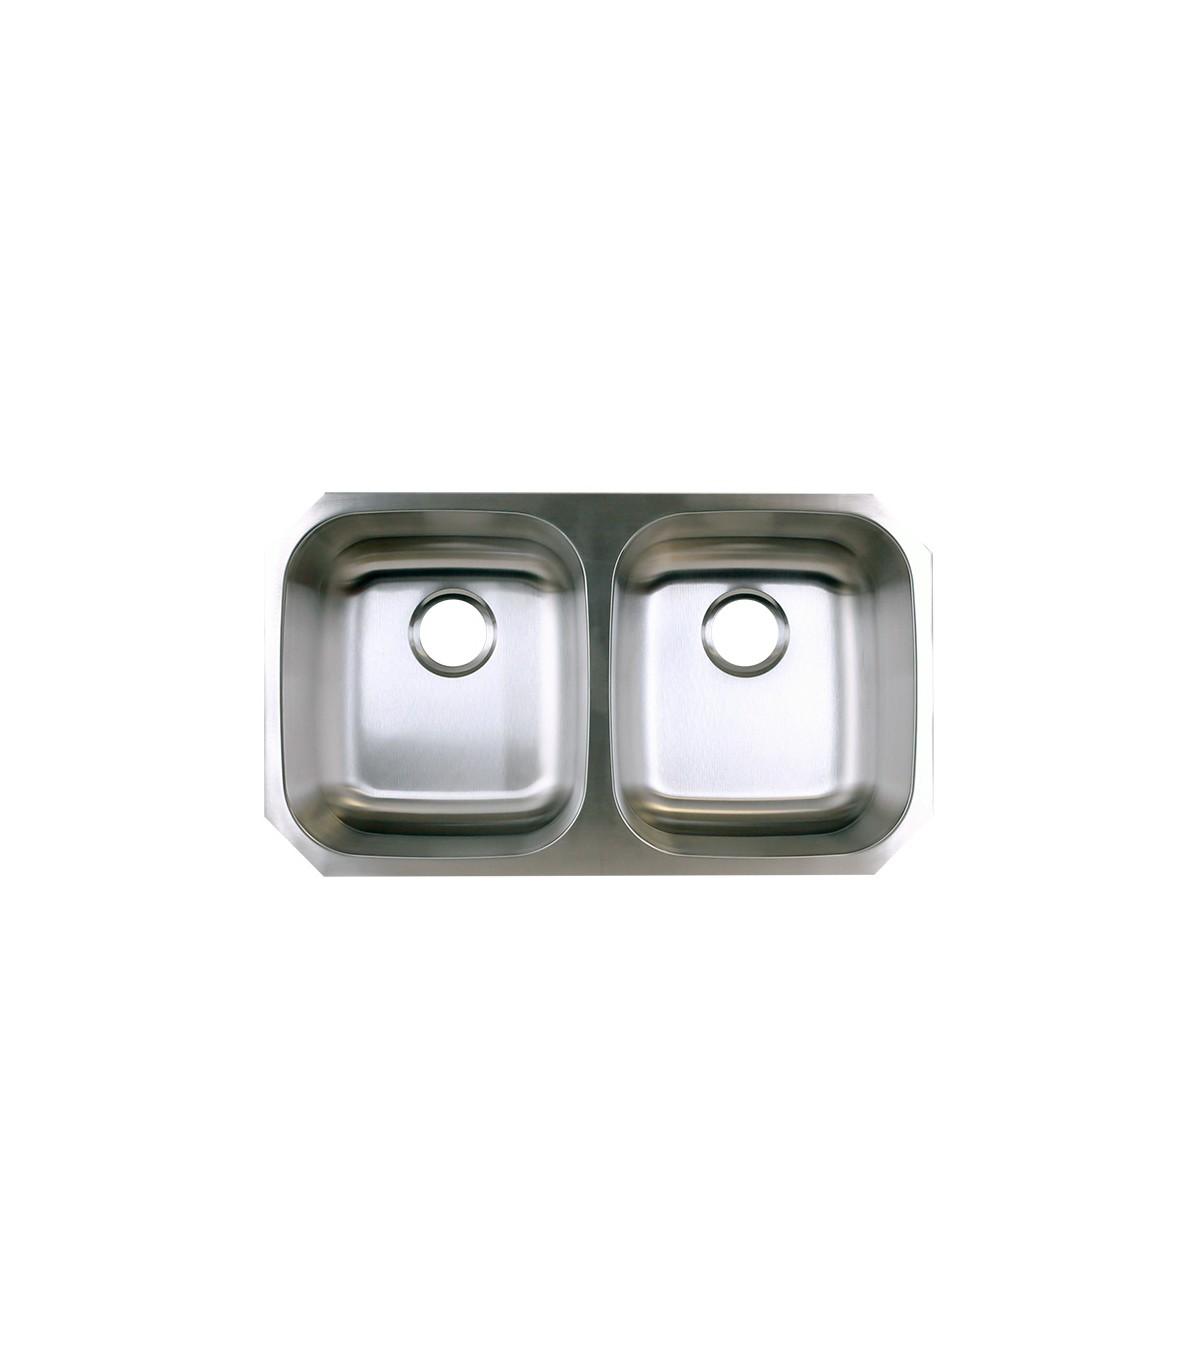 LS 88 Double Bowl Kitchen Sink